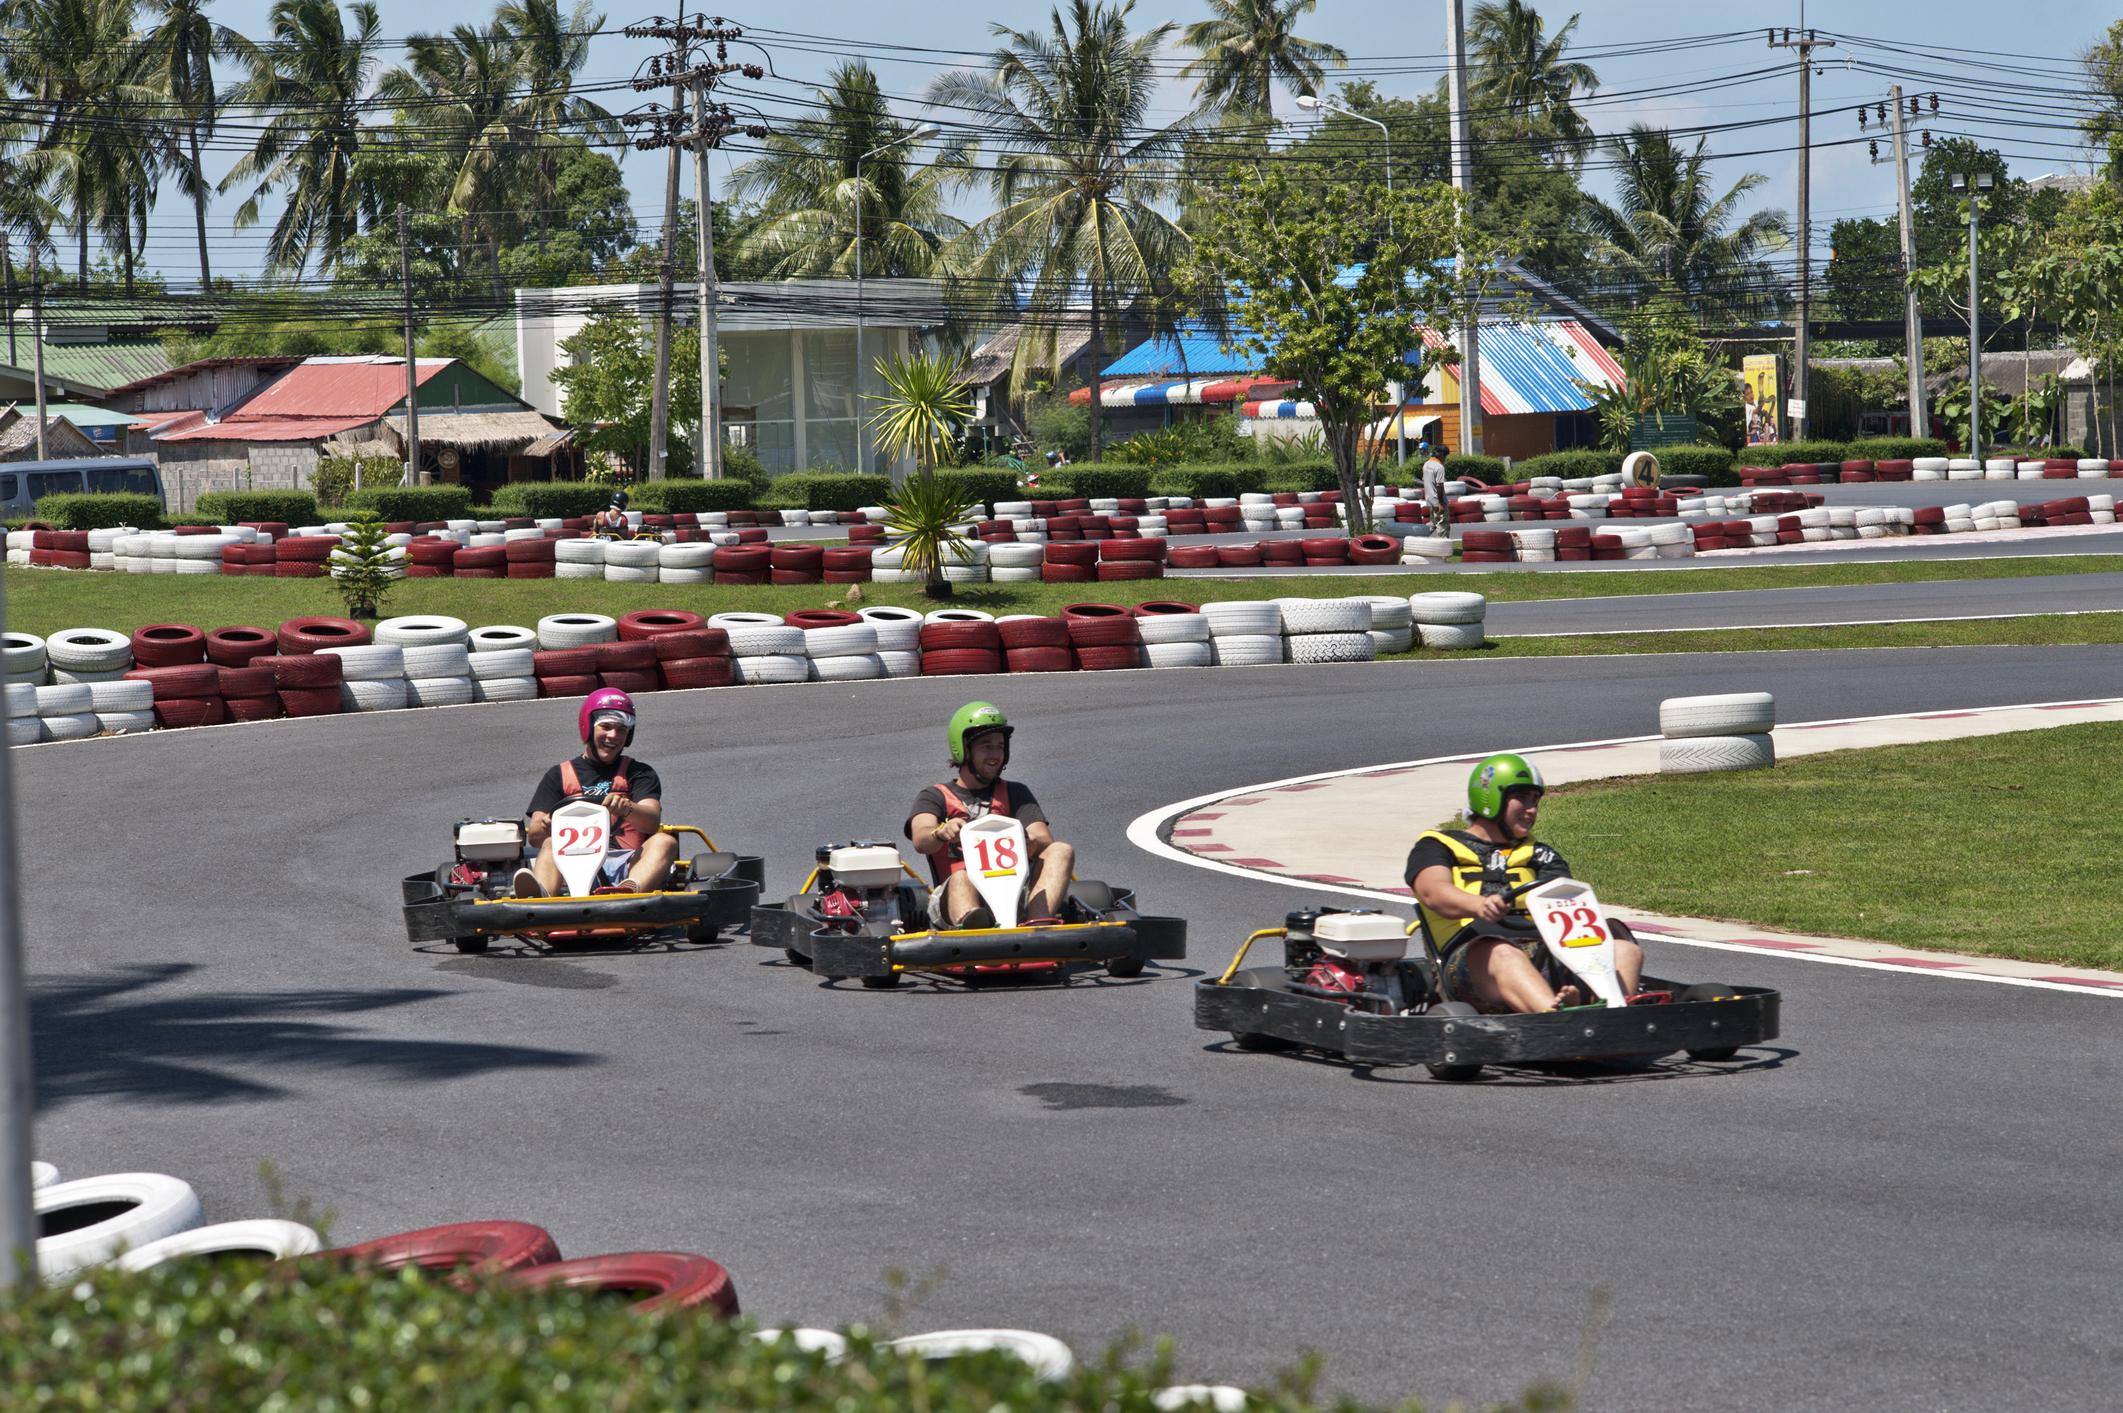 Book a go-kart session